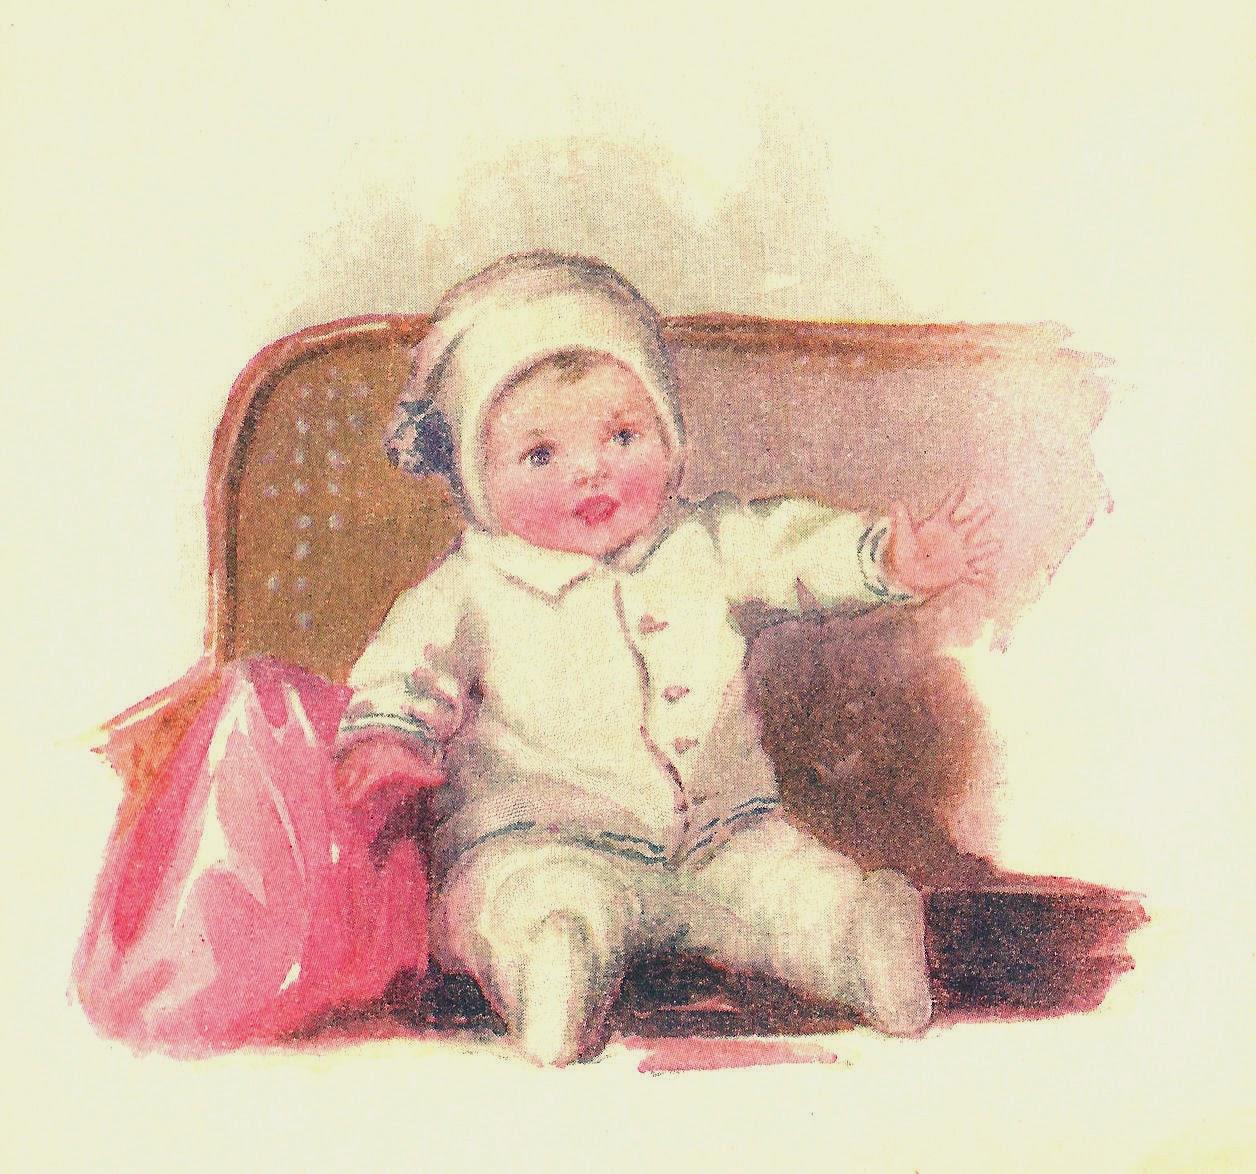 http://1.bp.blogspot.com/-hUAs93xlPXM/U1QfDiHxF3I/AAAAAAAATp4/xeZQ4q7bLPY/s1600/visiting_baby.jpg